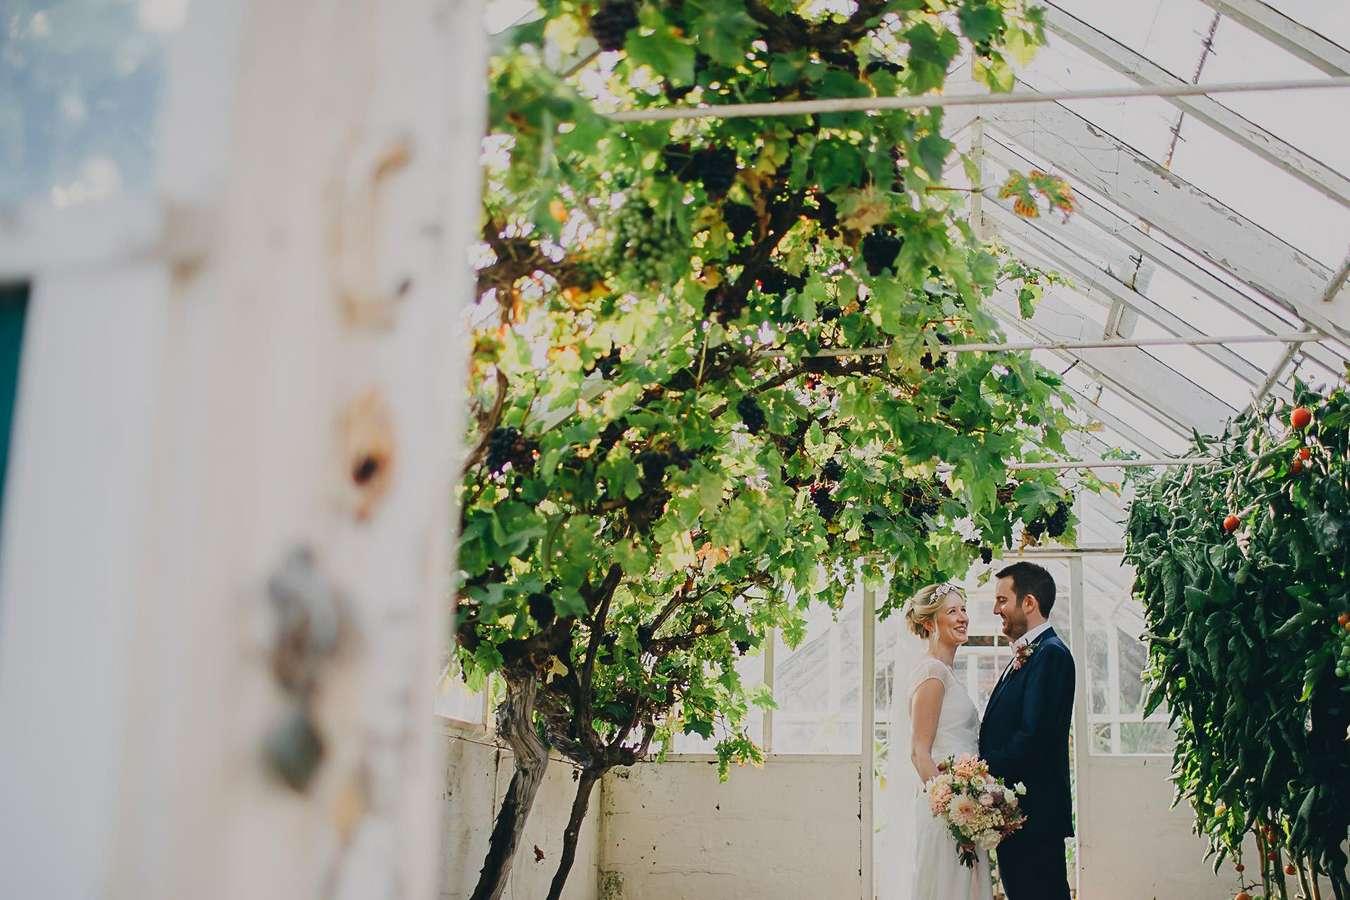 Cornish Wedding Photography - Polpier and Penpol